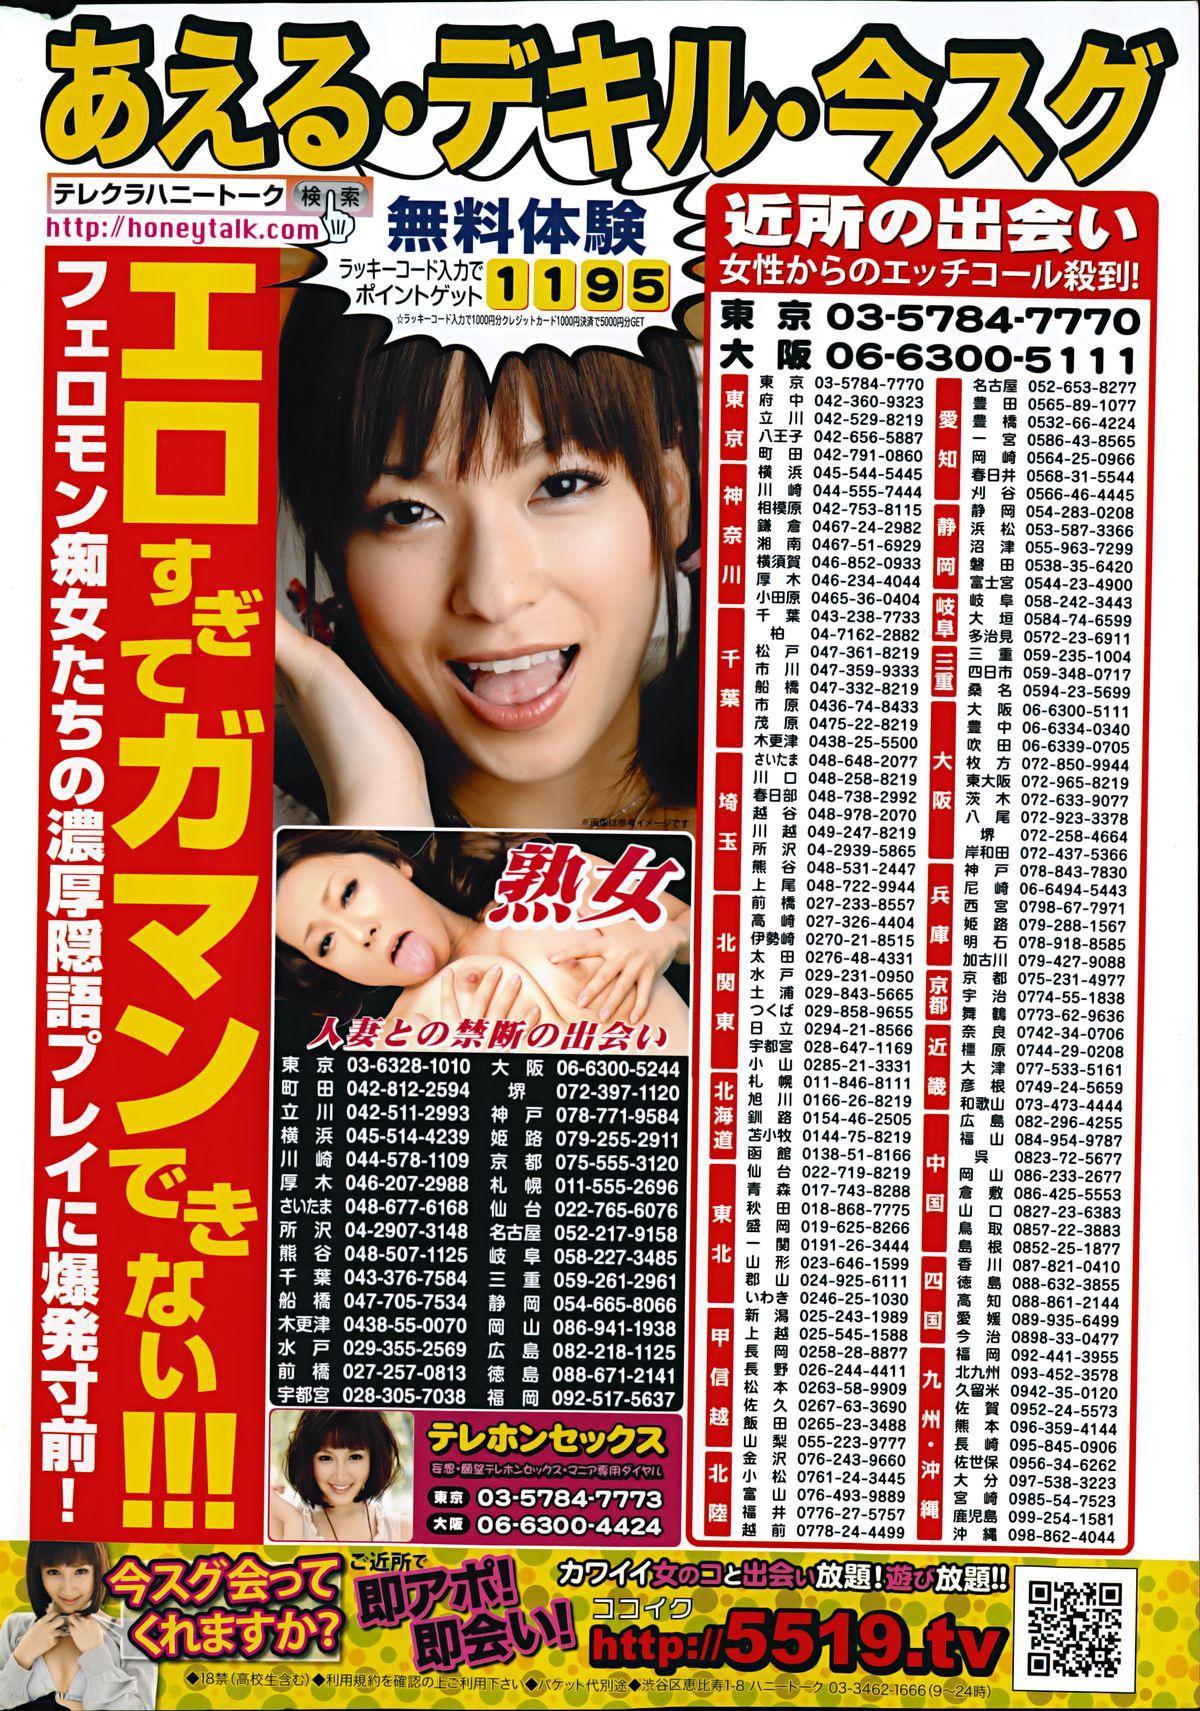 COMIC Penguin Club Sanzokuban 2014-11 1